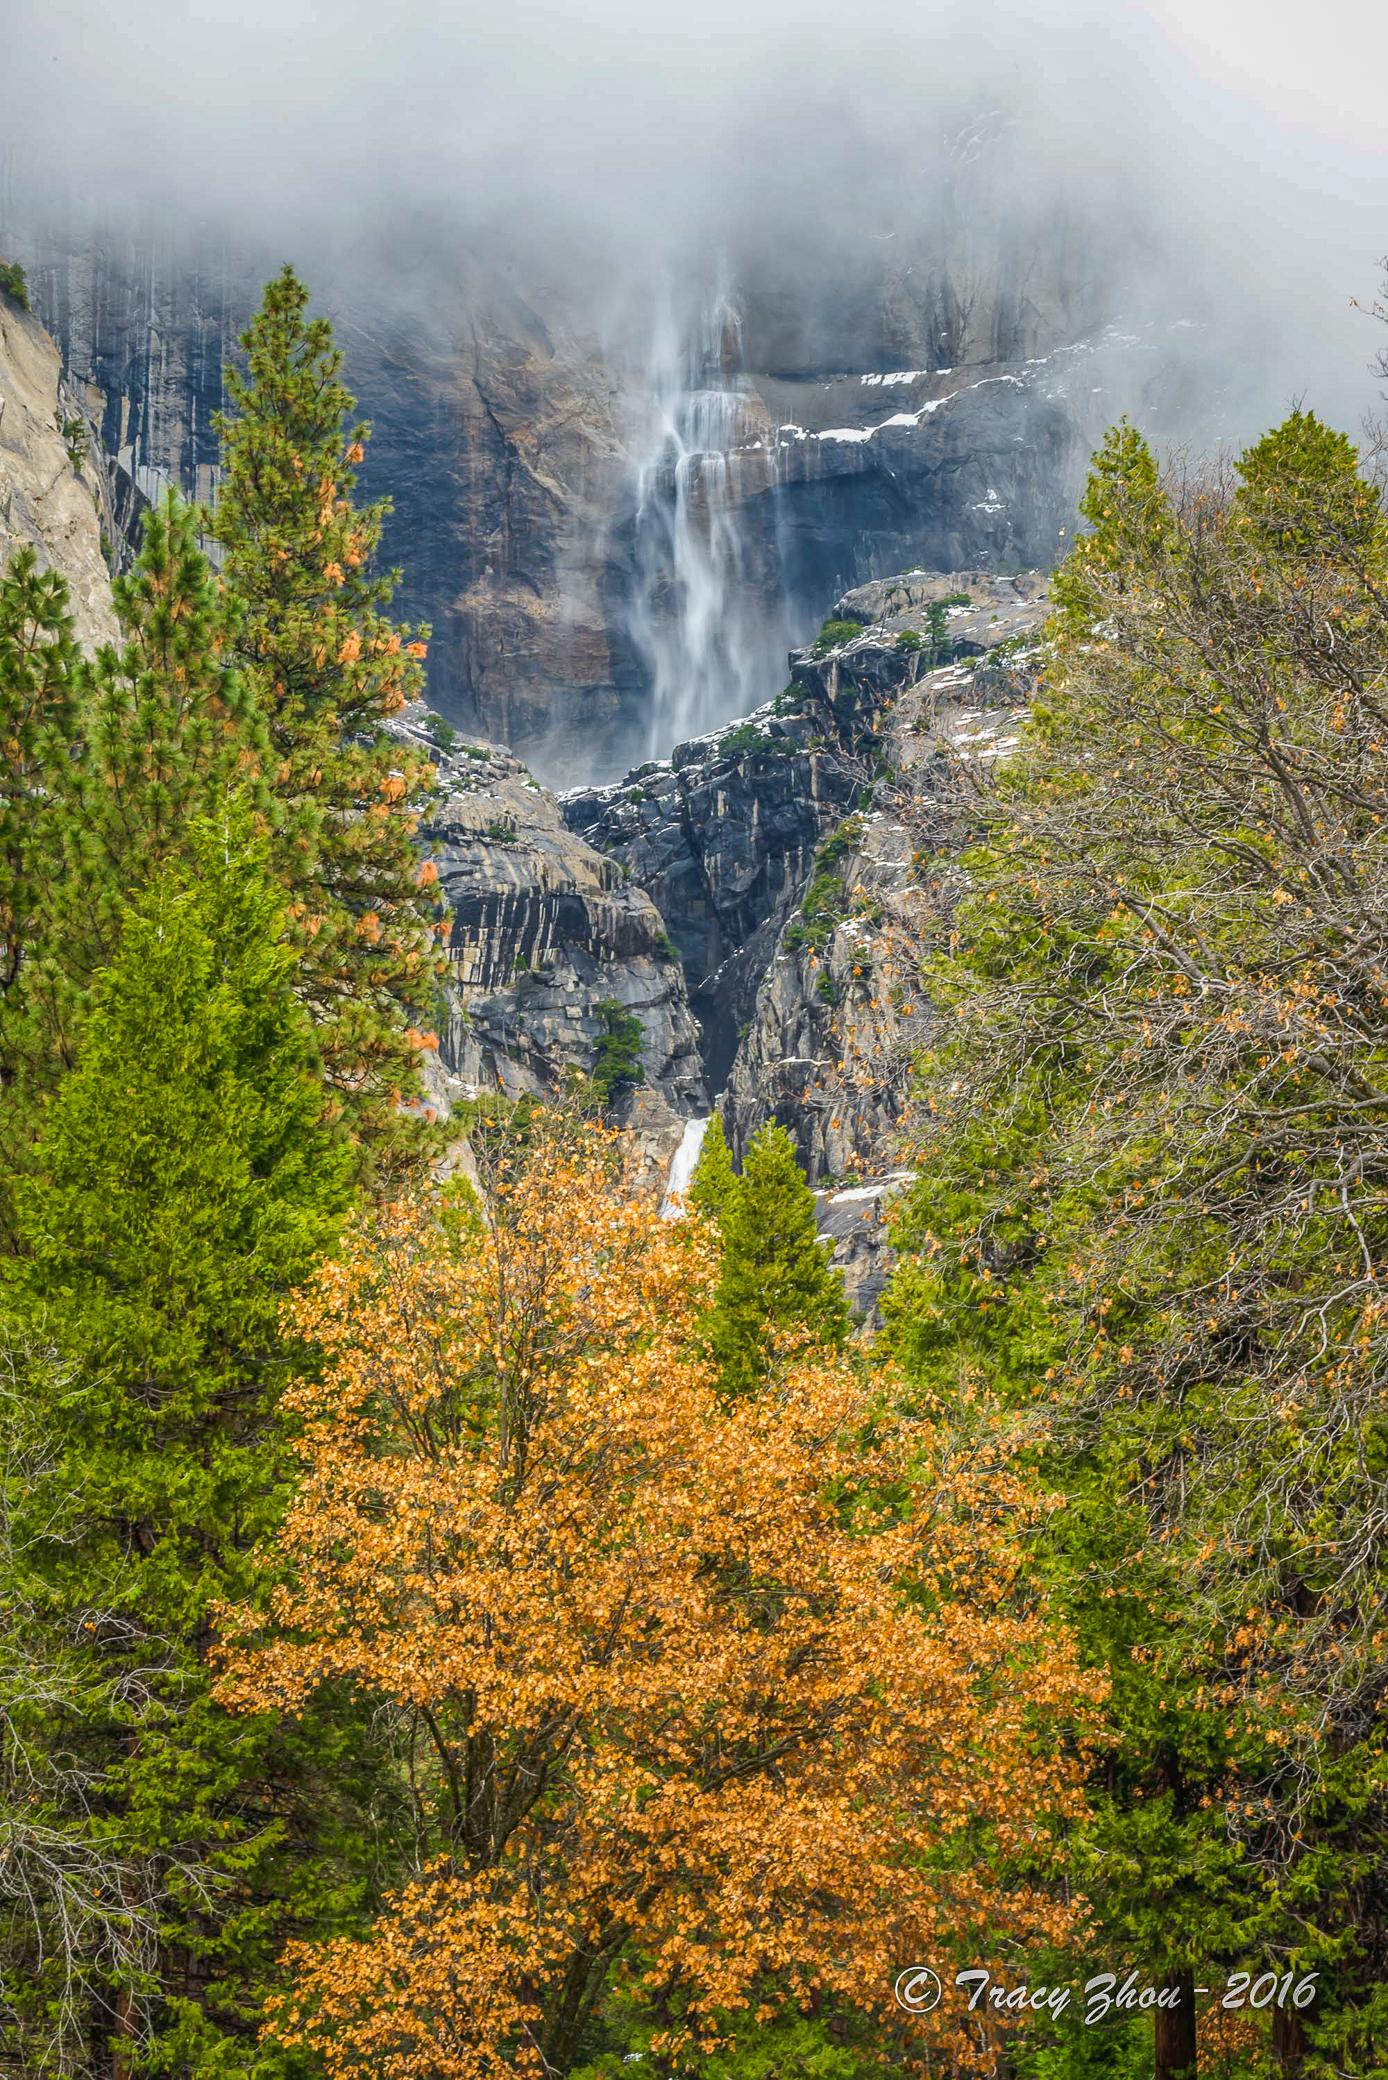 Yosemite: Snow White, Fairytale Forest - California Fall Color